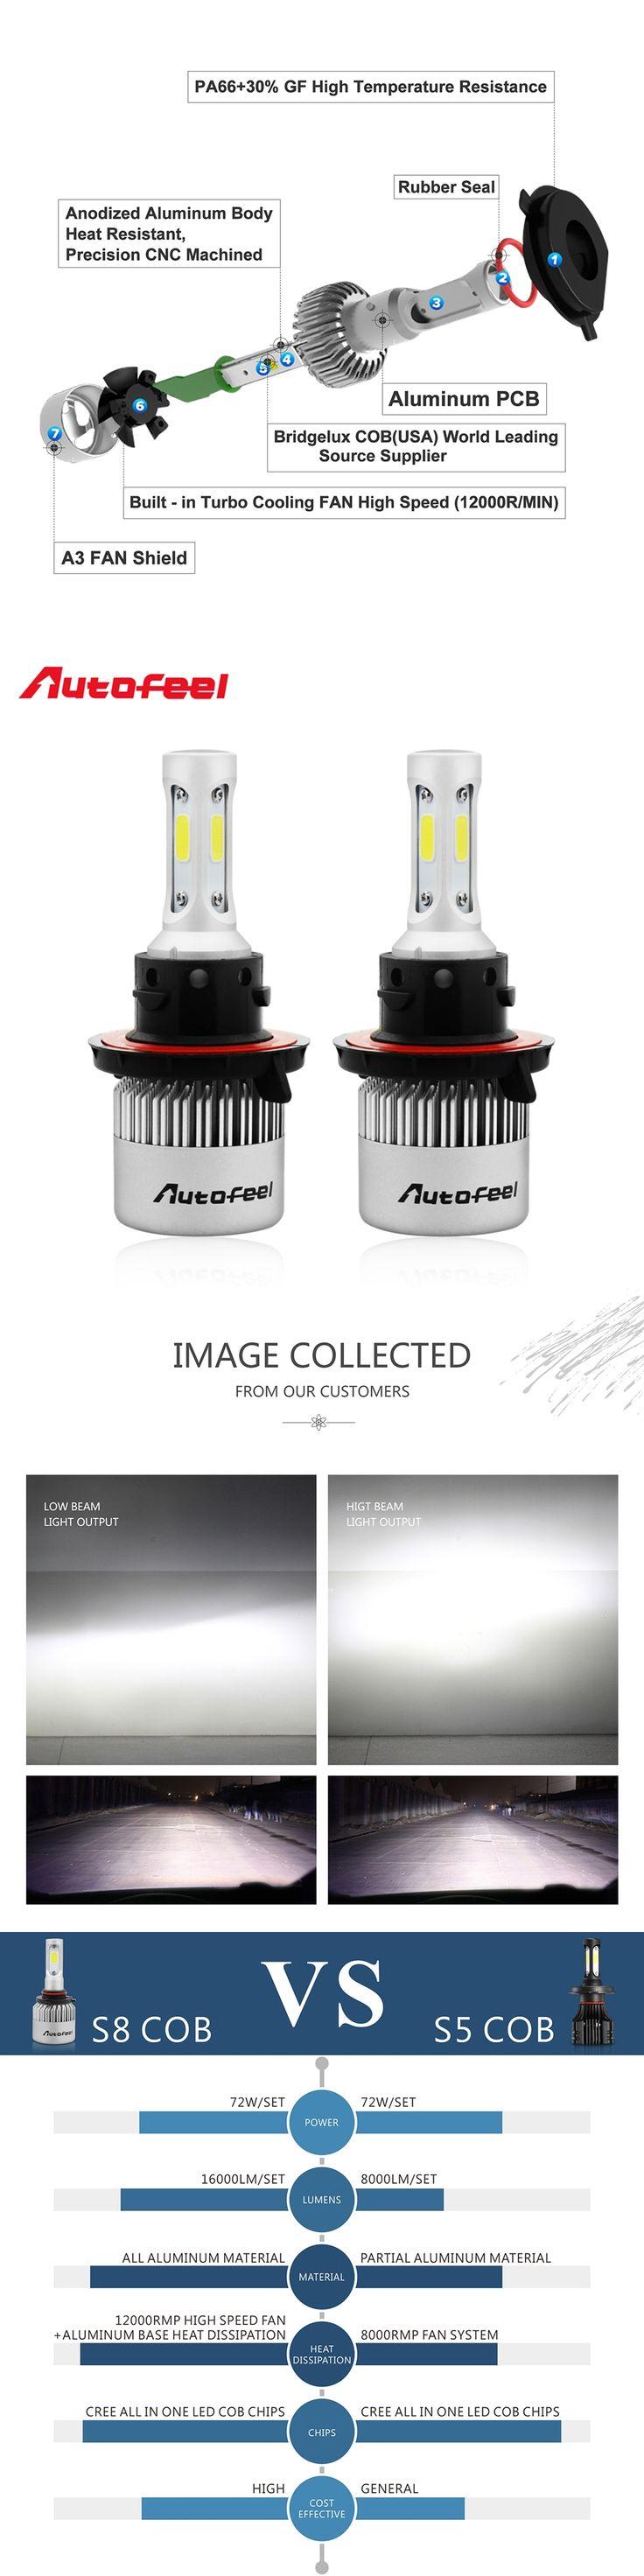 Autofeel H13 9008 Led Headlight Bulbs Kit COB Hi-Lo Beam Automobiles Front Fog Light Lamps 72W/16000LM/6000K Voiture Headlights